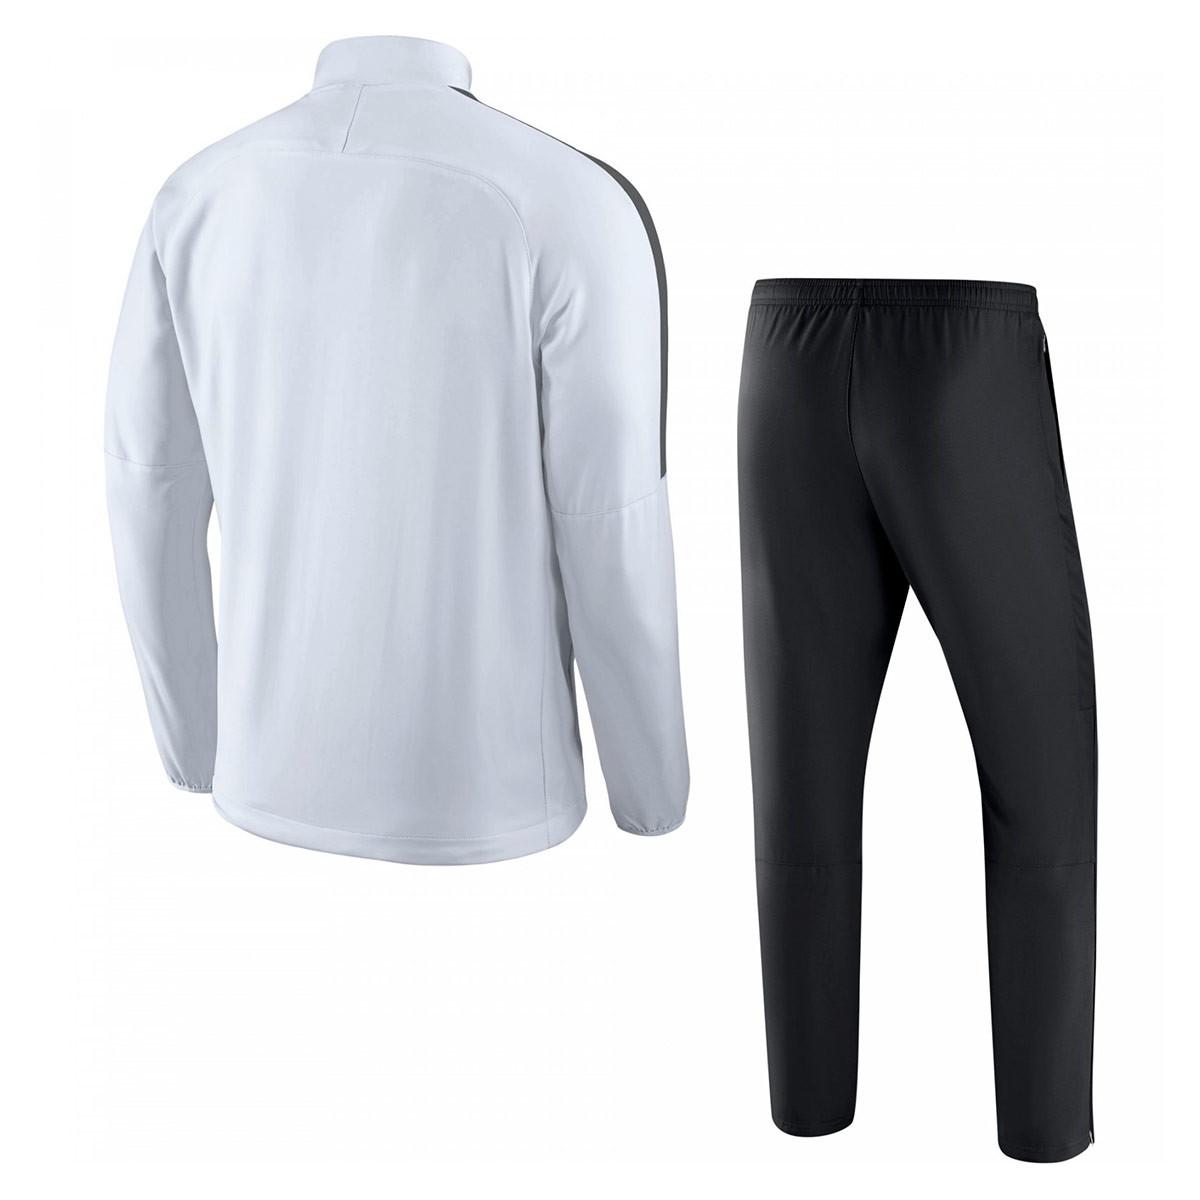 341154932 Tracksuit Nike Academy 18 Woven White-Black - Football store Fútbol ...